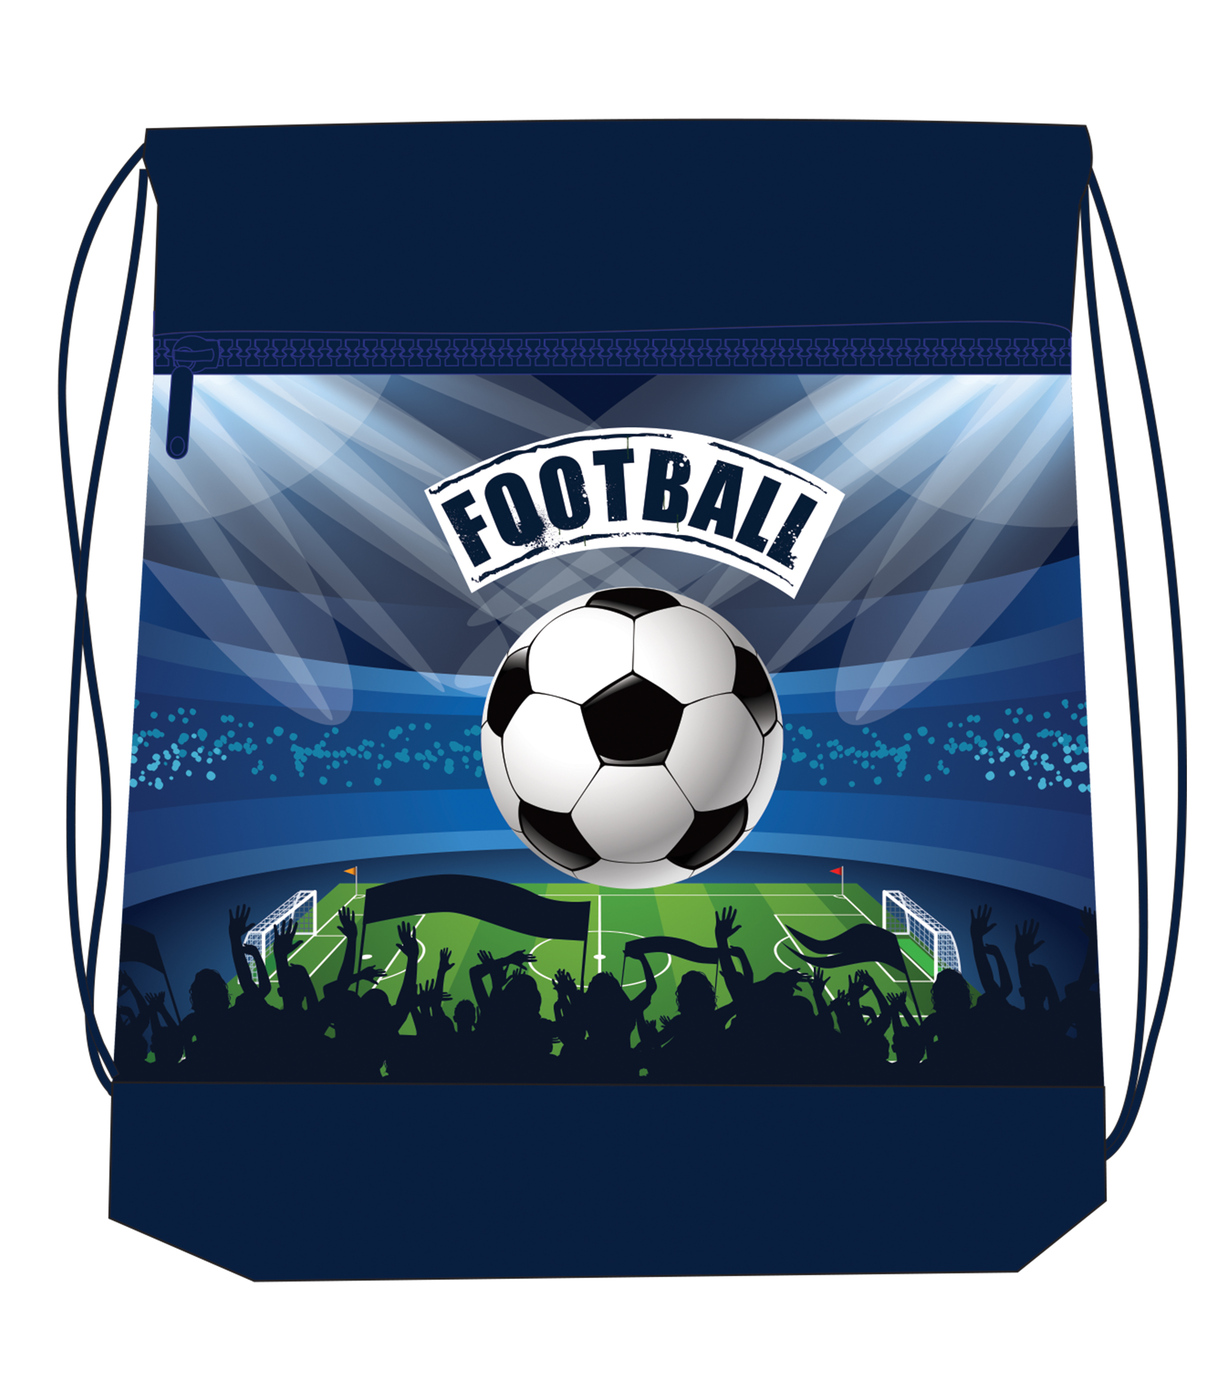 Ранец Belmil Classy 403-13/415 FOOTBALL CLUB - Белмил Футбольный клуб, - фото 7